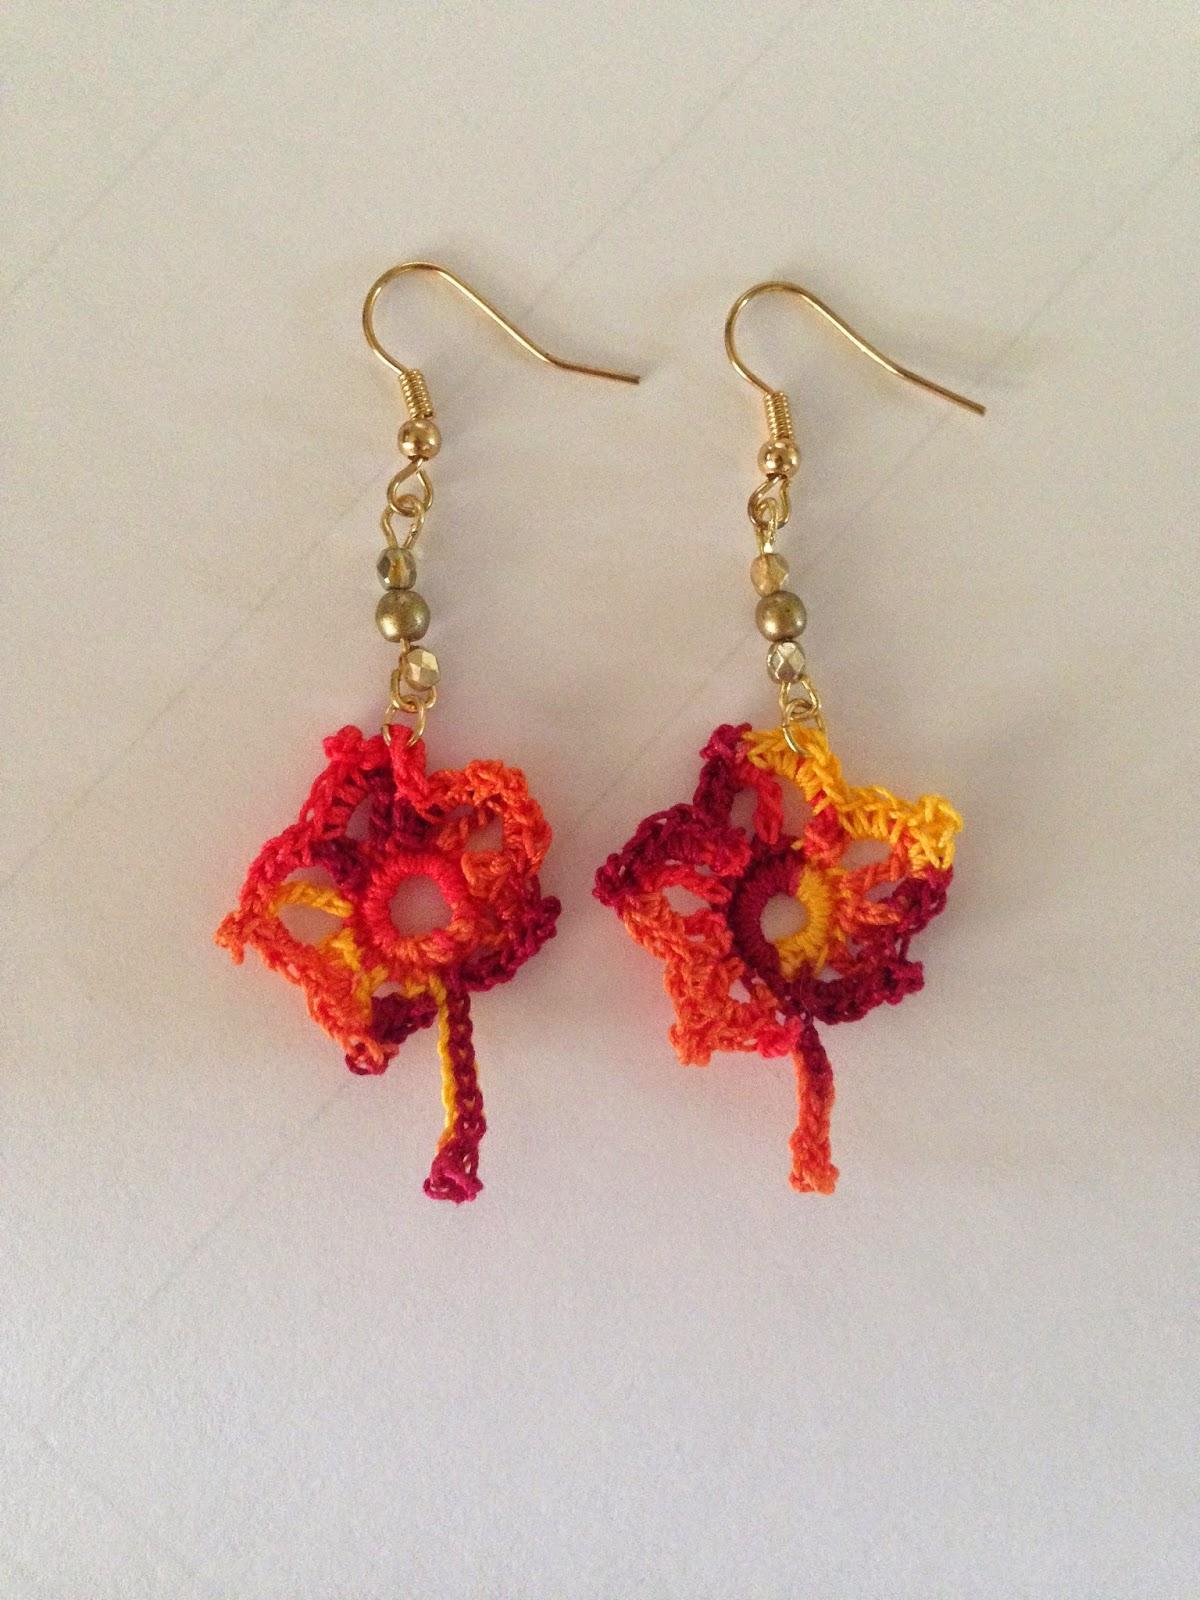 All Things Chateau de Savoy: Fall Leaves Crochet Earrings